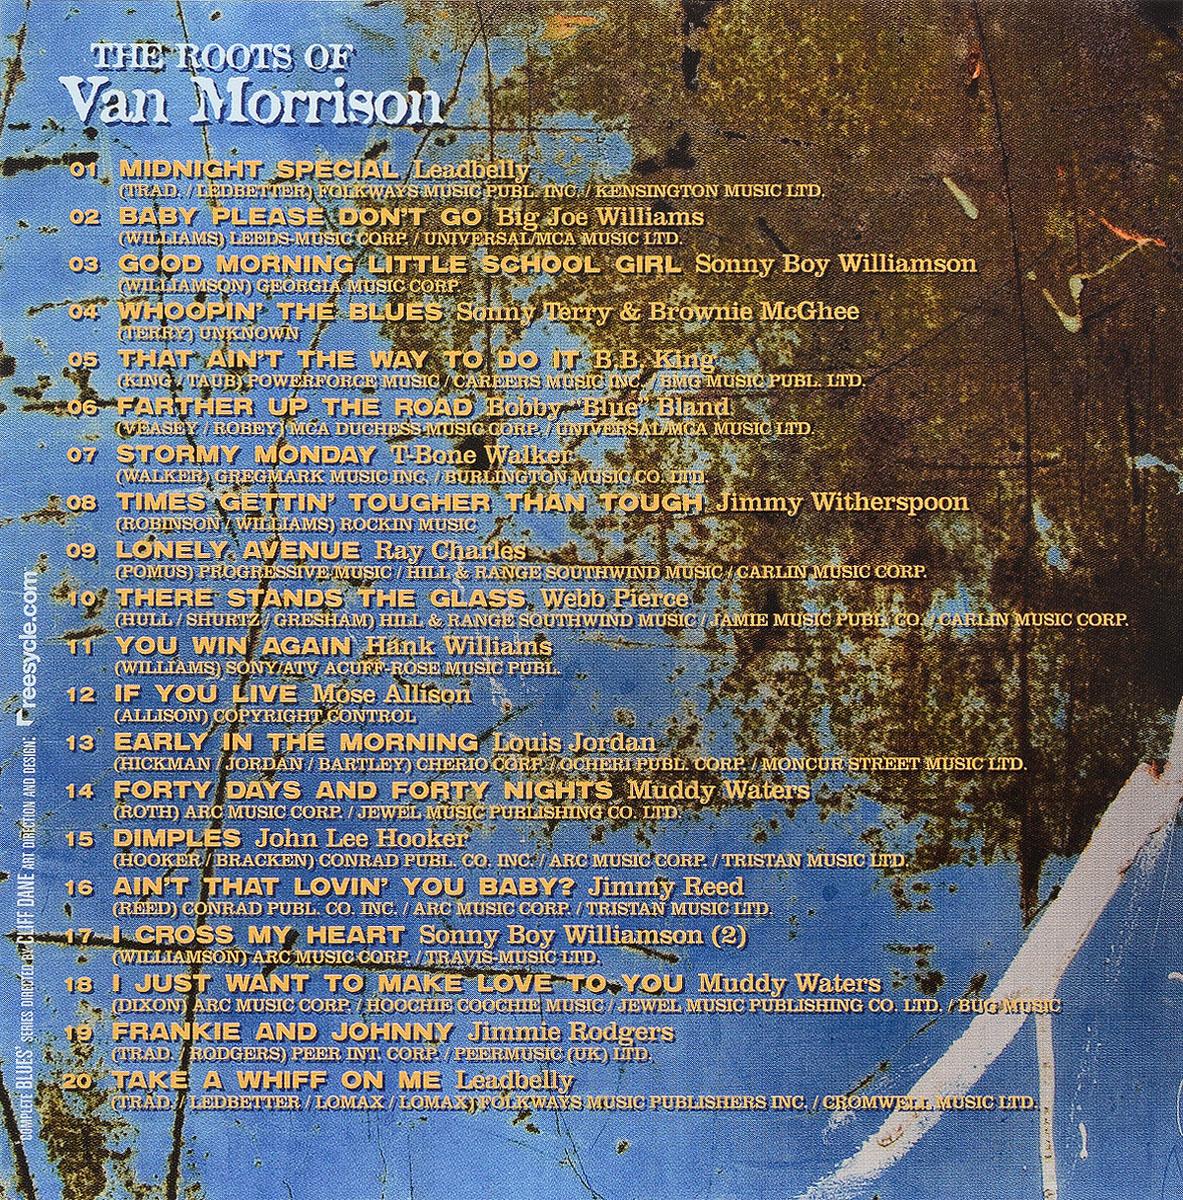 Complete Blues.  The Roots Of Van Morrison Волтэкс-инвест,Snapper Music